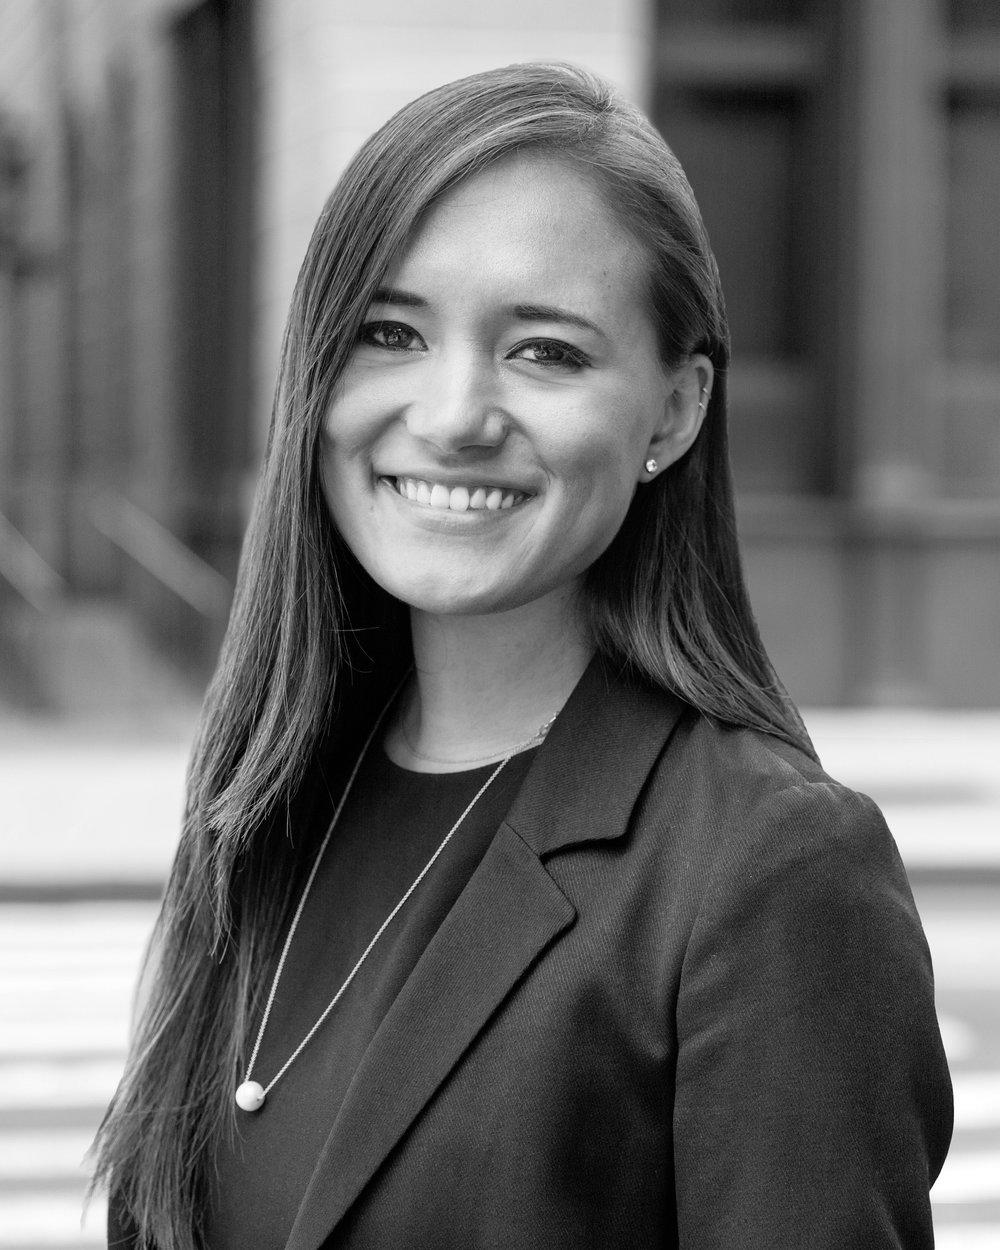 Saadiah Schmidt, Senior Associate